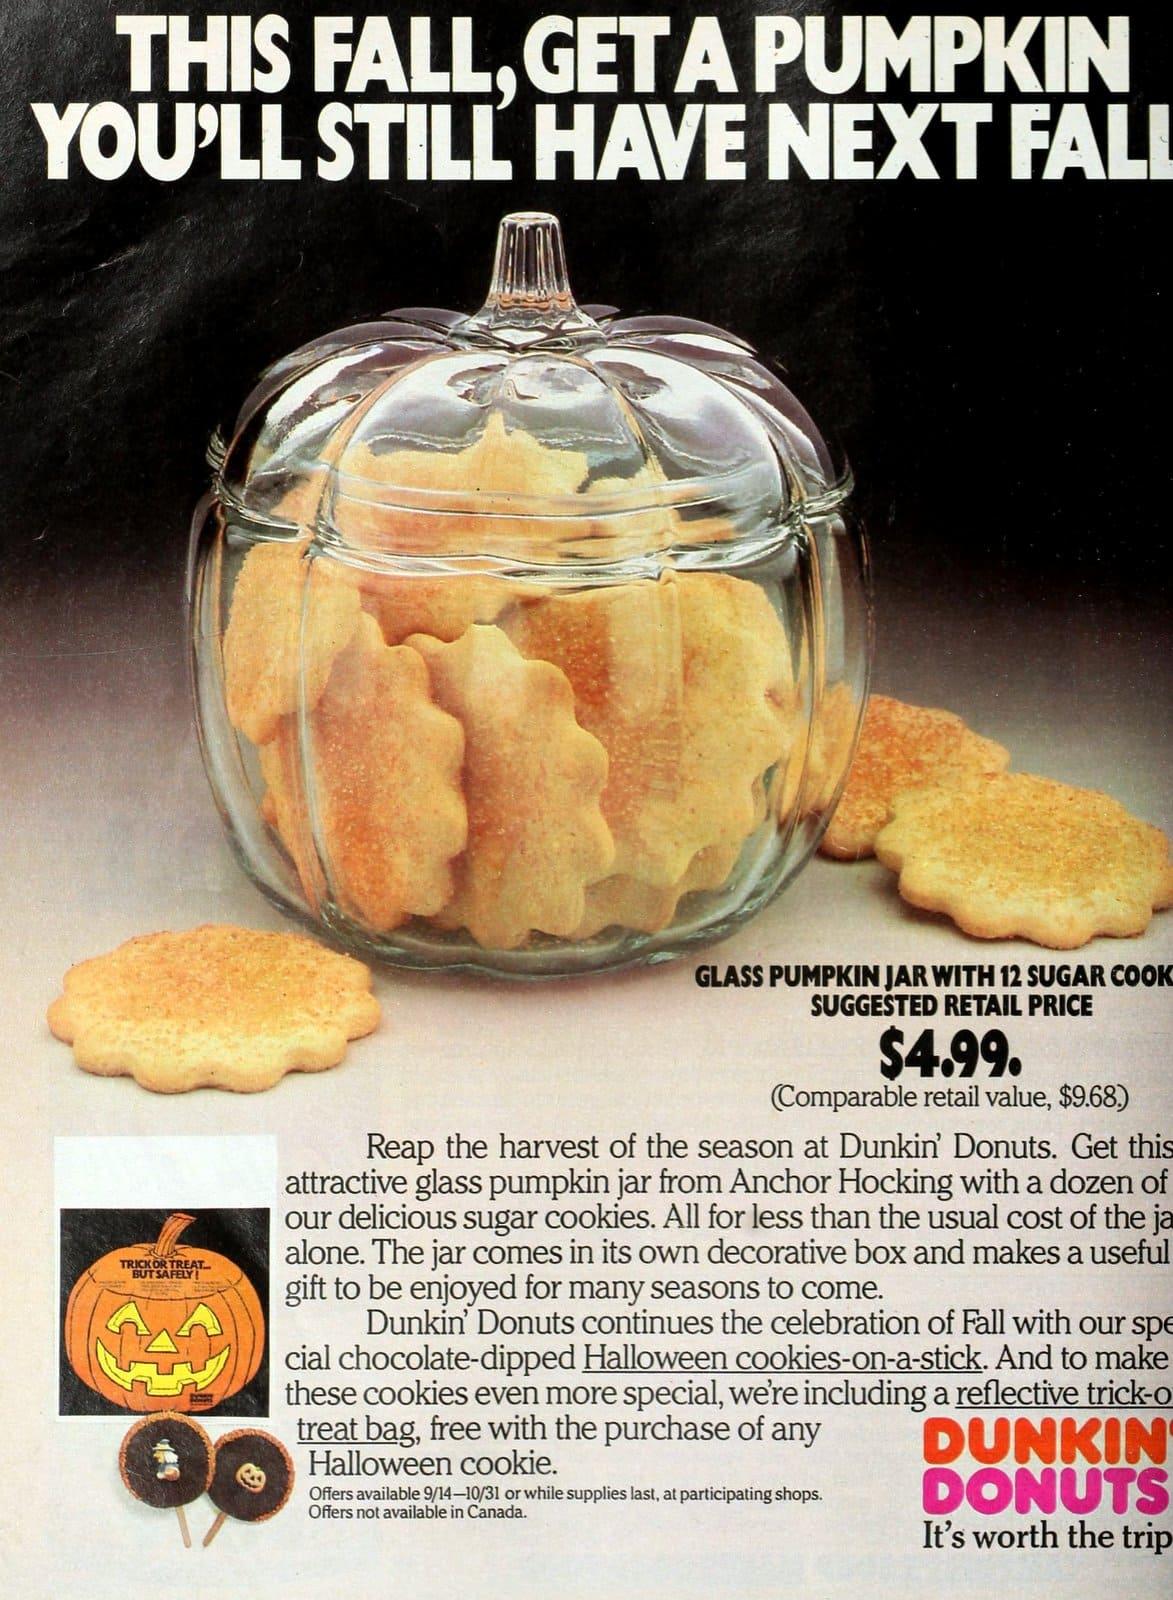 Dunkin' Donuts cookies - Halloween glass pumpkin jar (1986)